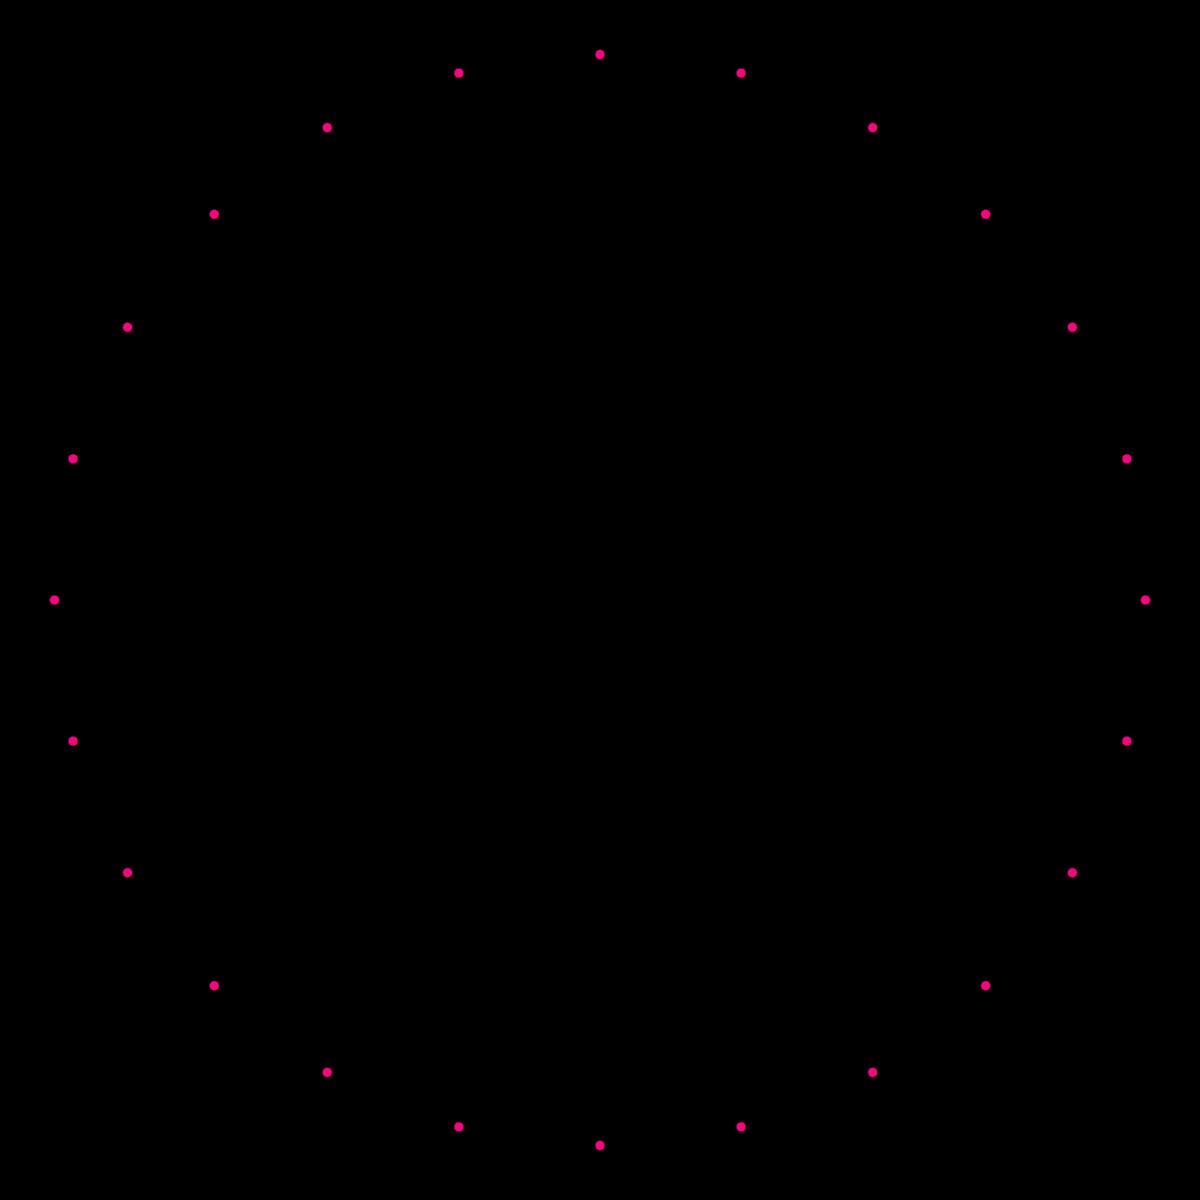 Fraction clipart polygon. Icositetragon wikipedia